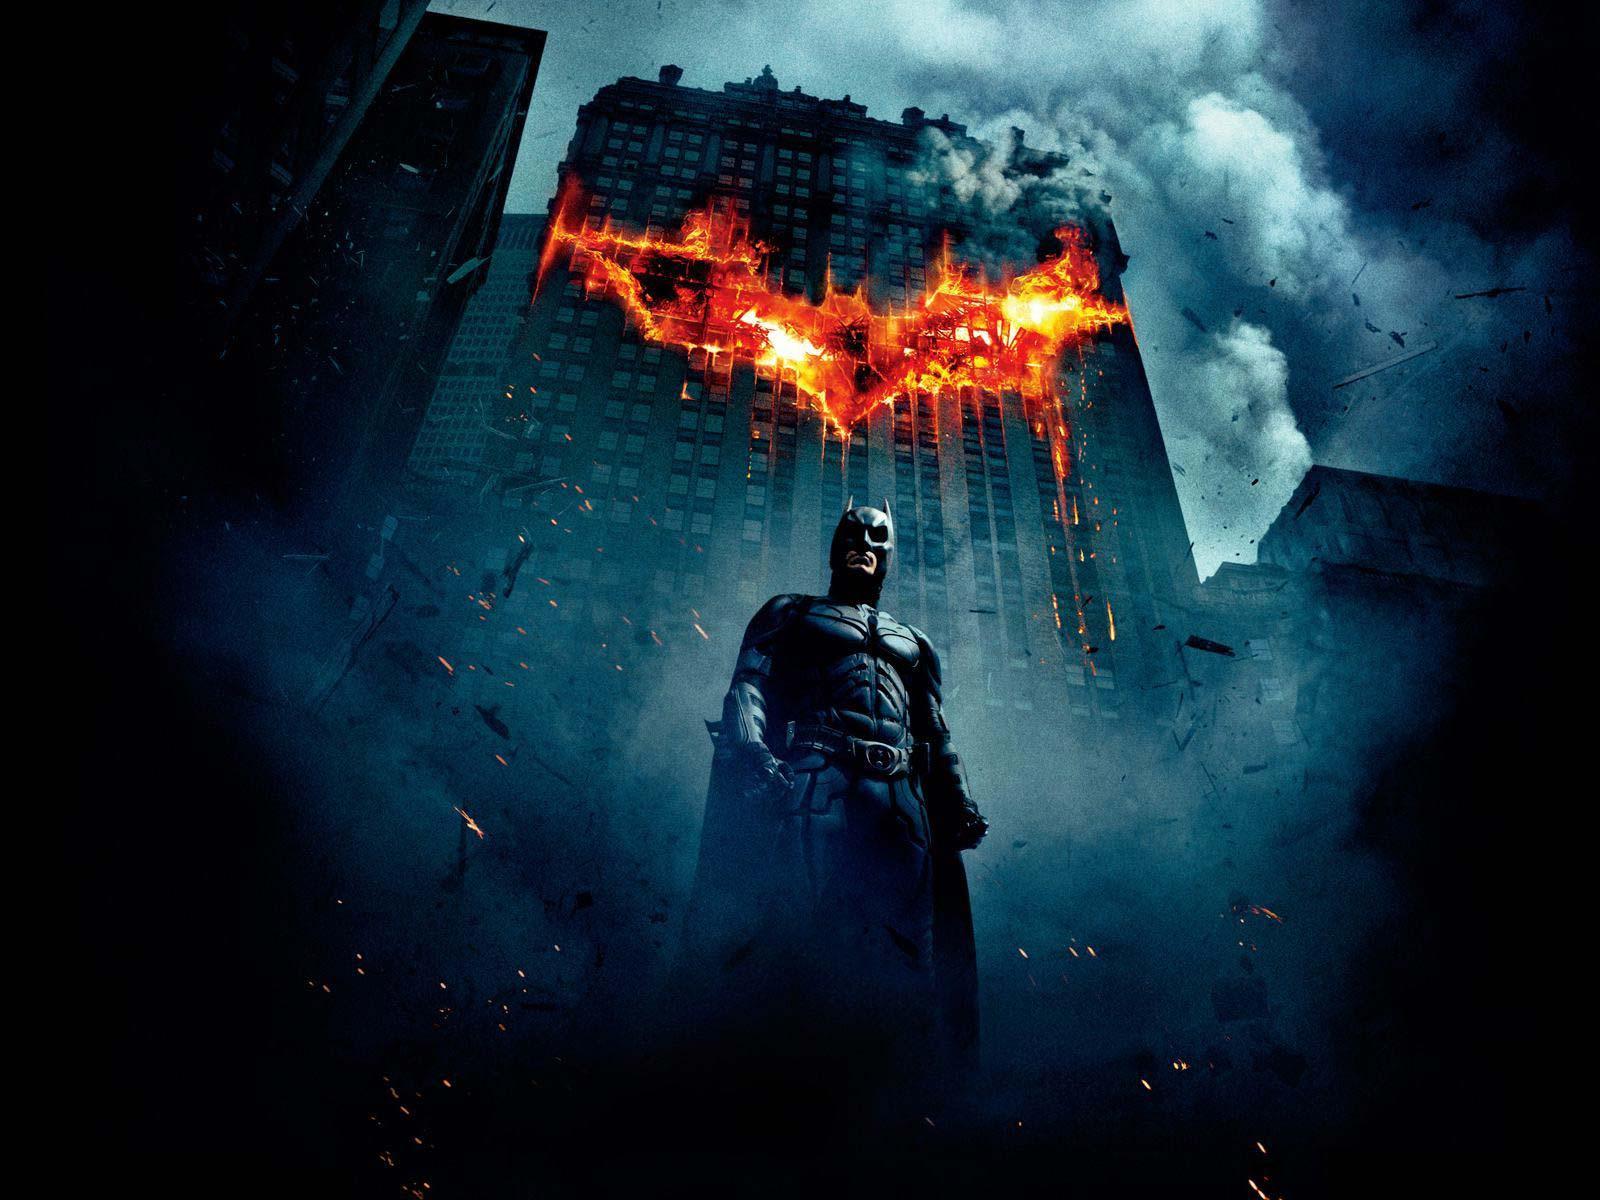 Batman movie Wallpaper 1600x1200